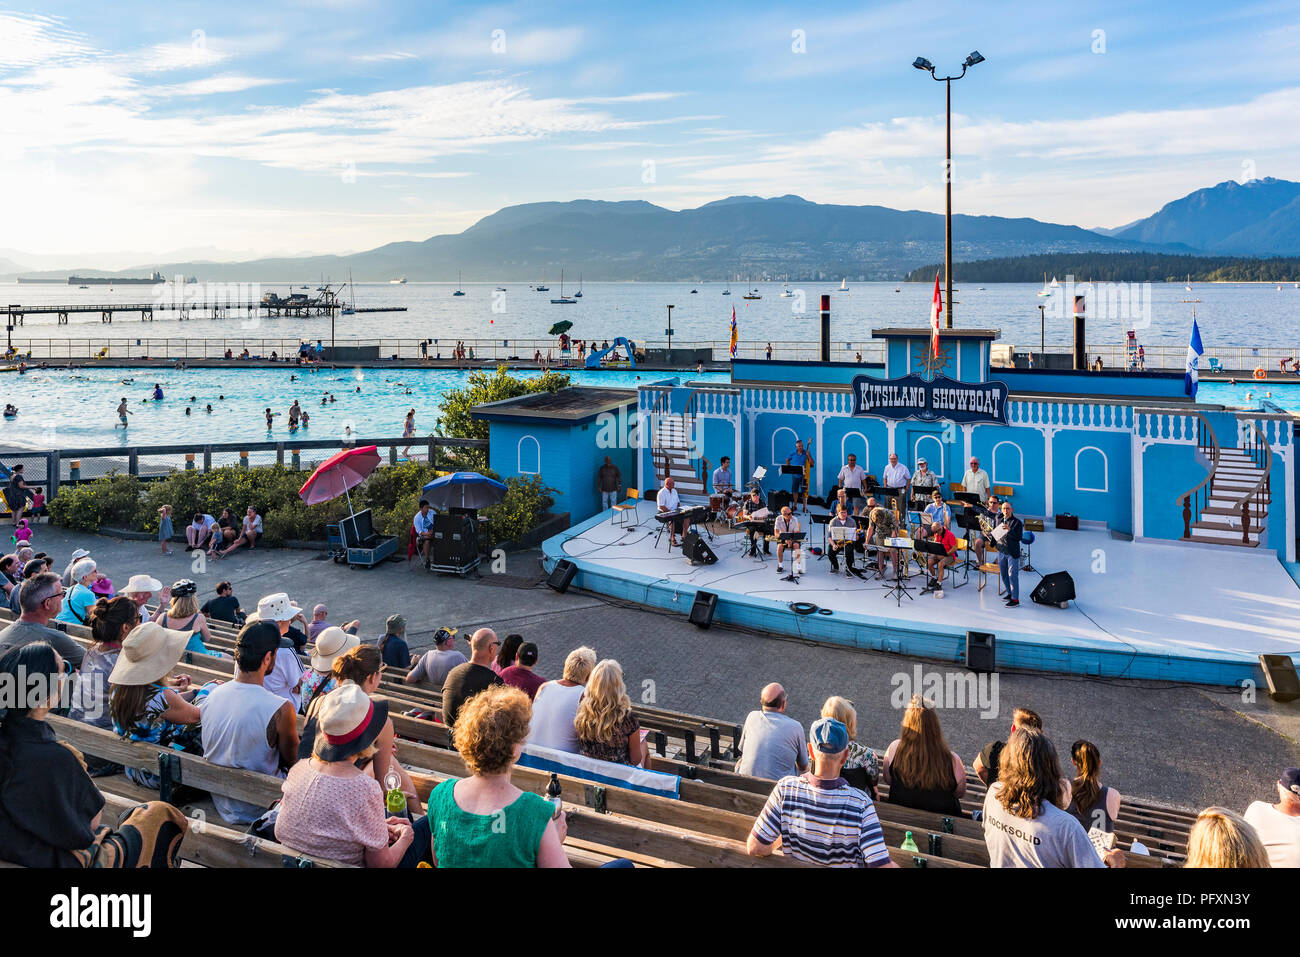 Communauté Urbana jazz orchestra, l'étape de Kitsilano Showboat, Kitsilano, Vancouver, British Columbia, Canada Banque D'Images